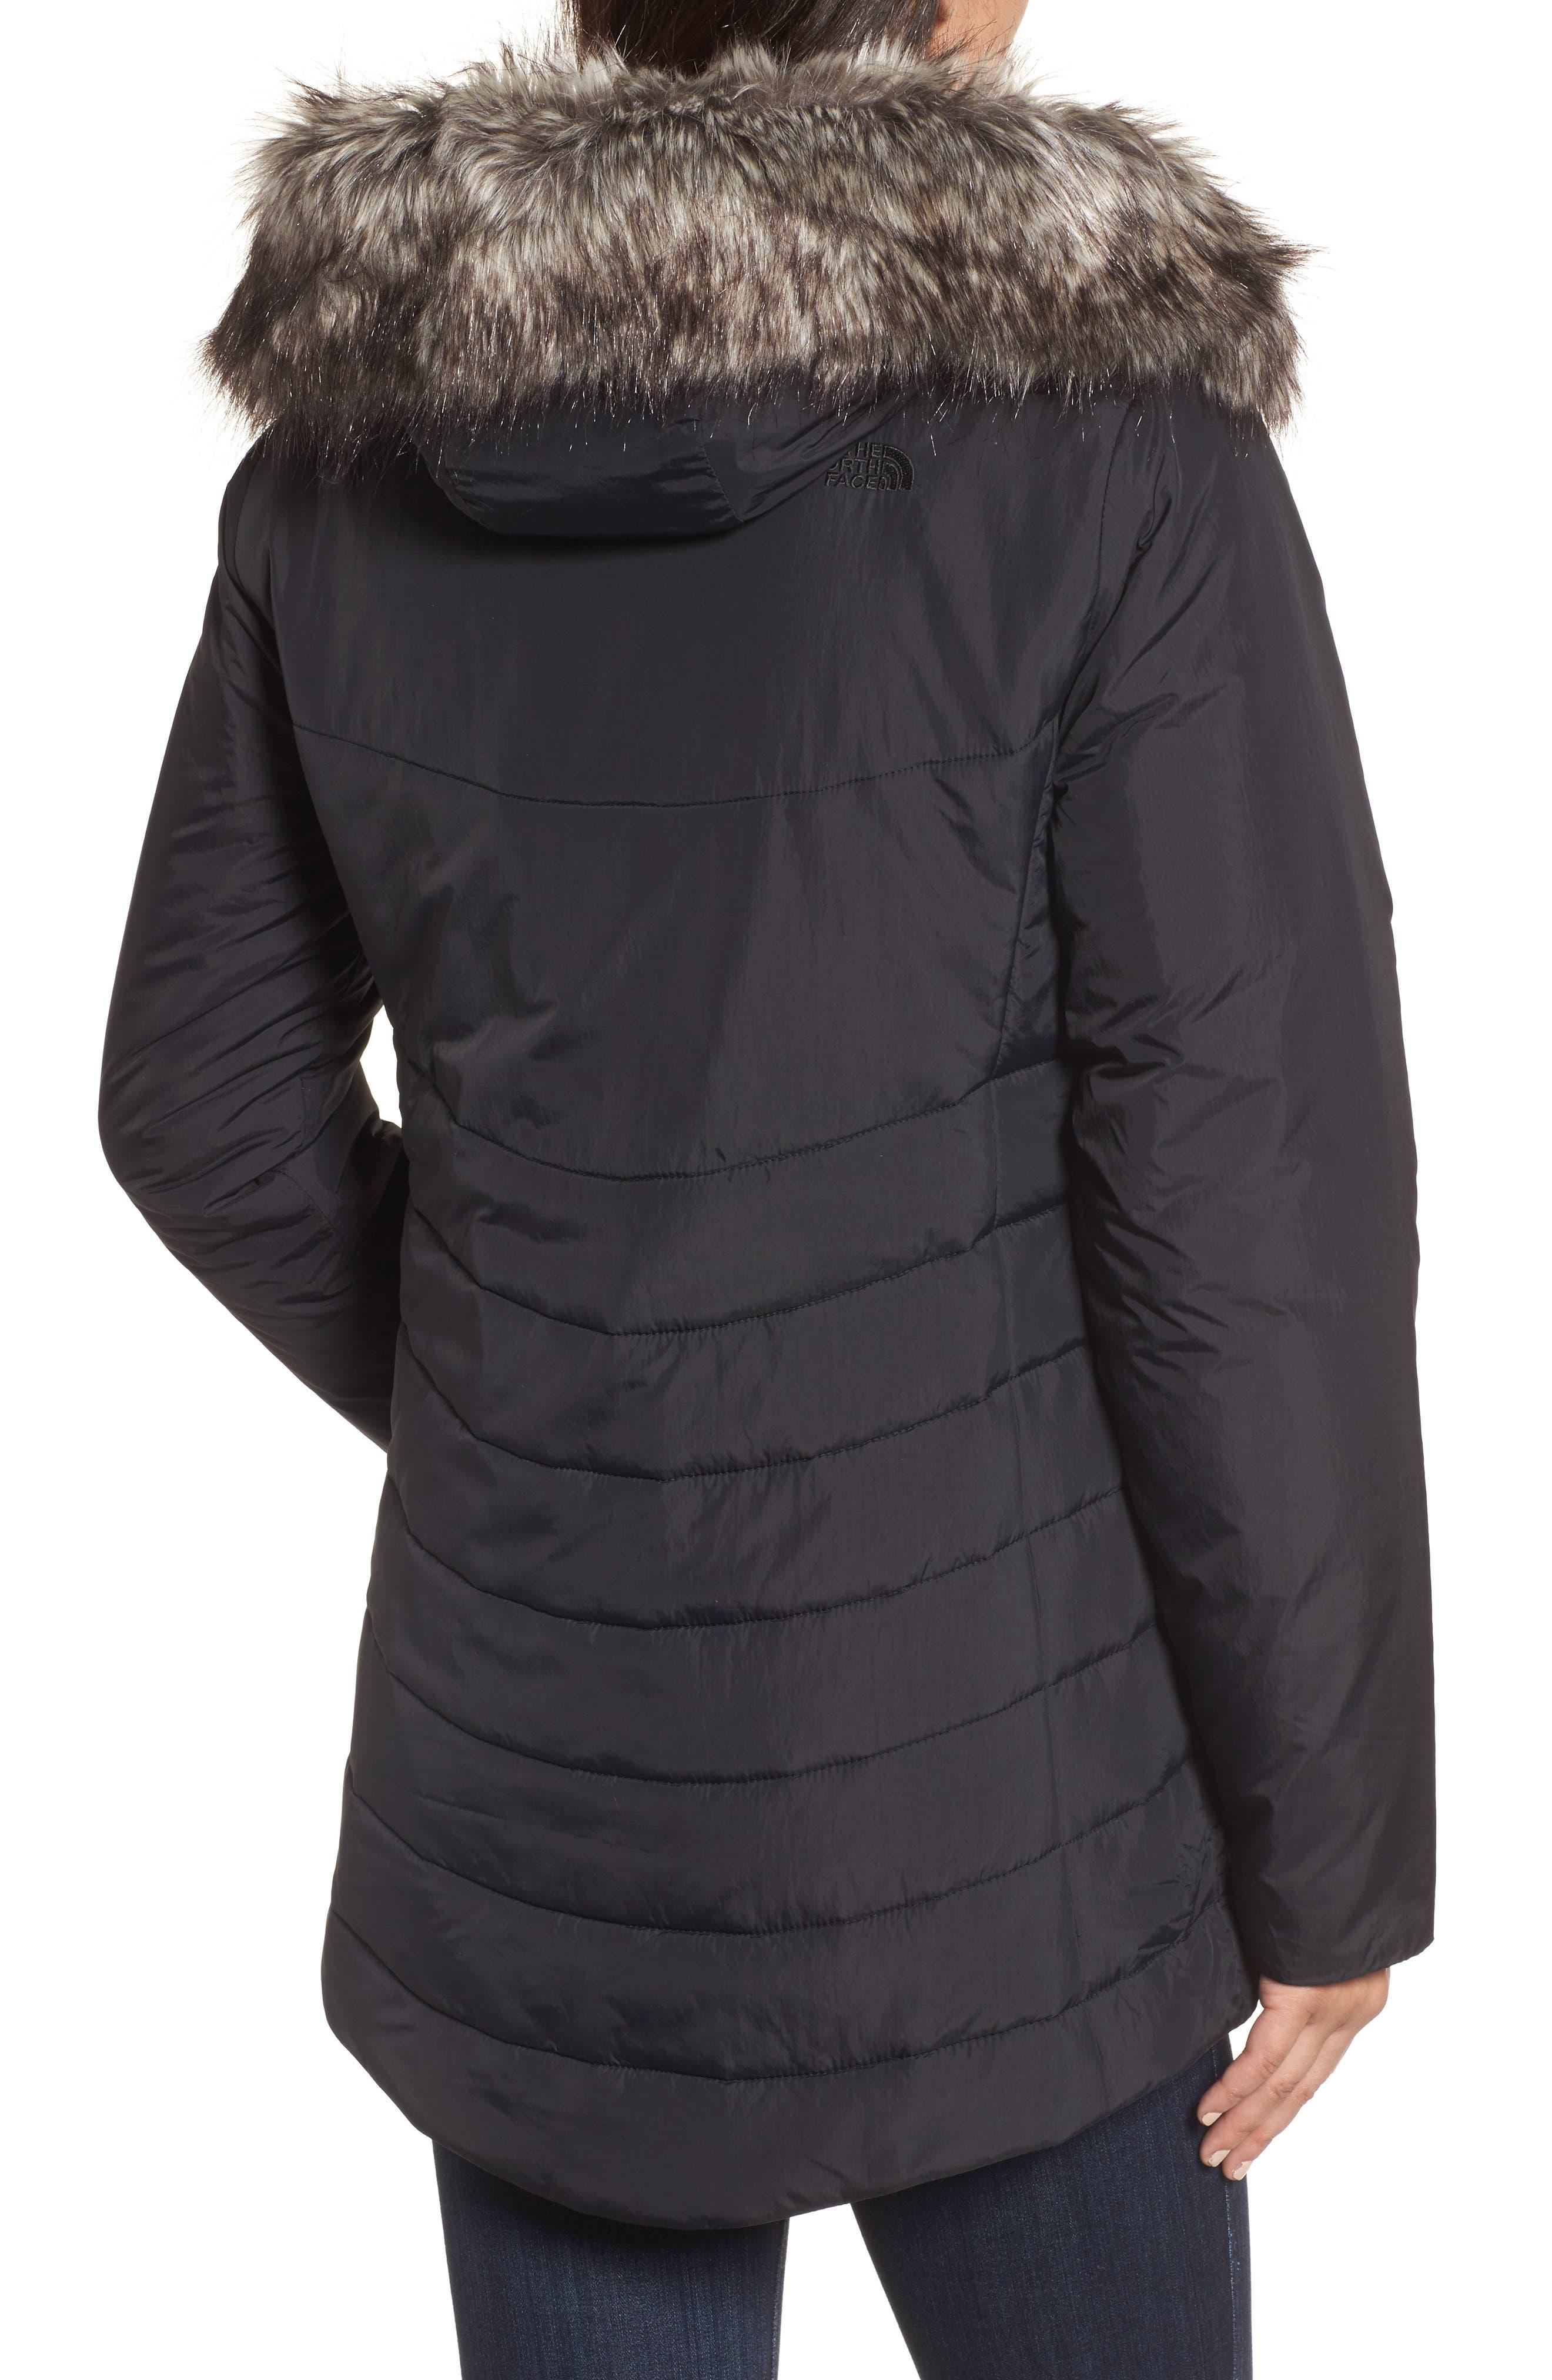 Alternate Image 2  - The North Face Harway Heatseeker™ Water-Resistant Jacket with Faux Fur Trim